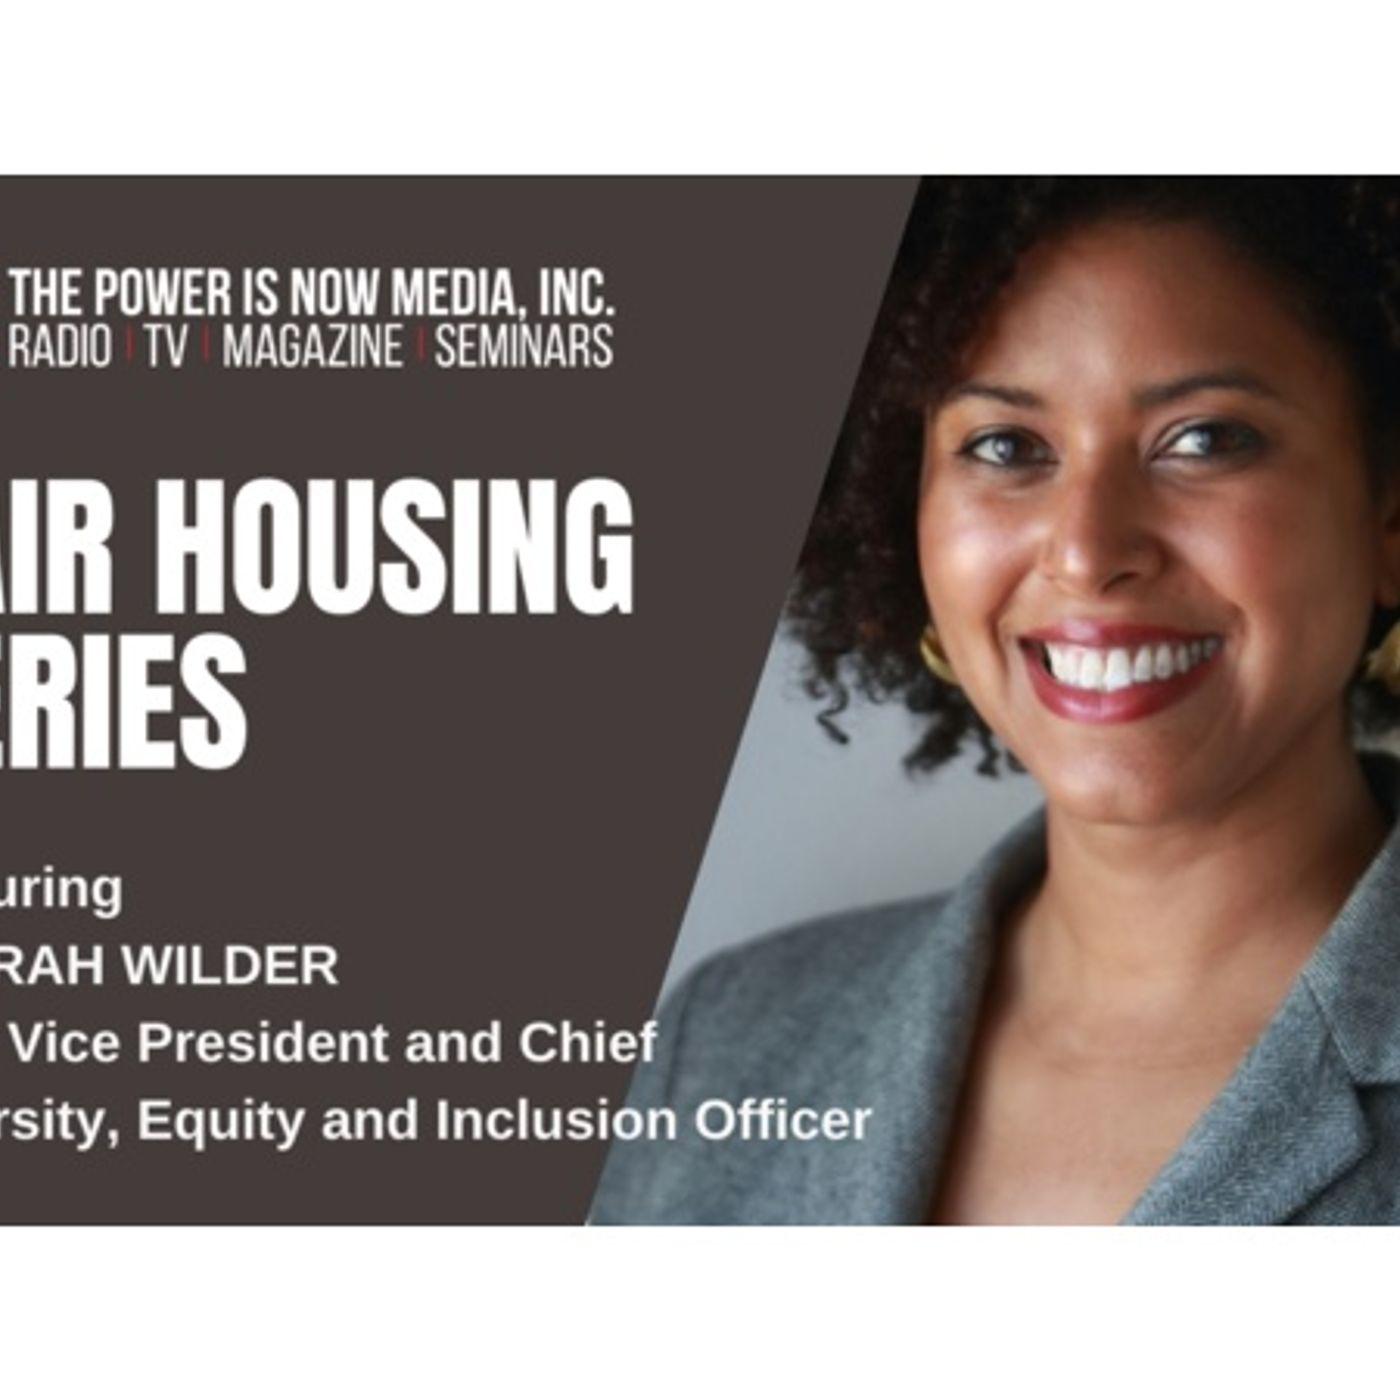 The Power Is Now Media Fair Housing Series 2021: Farah Wilder